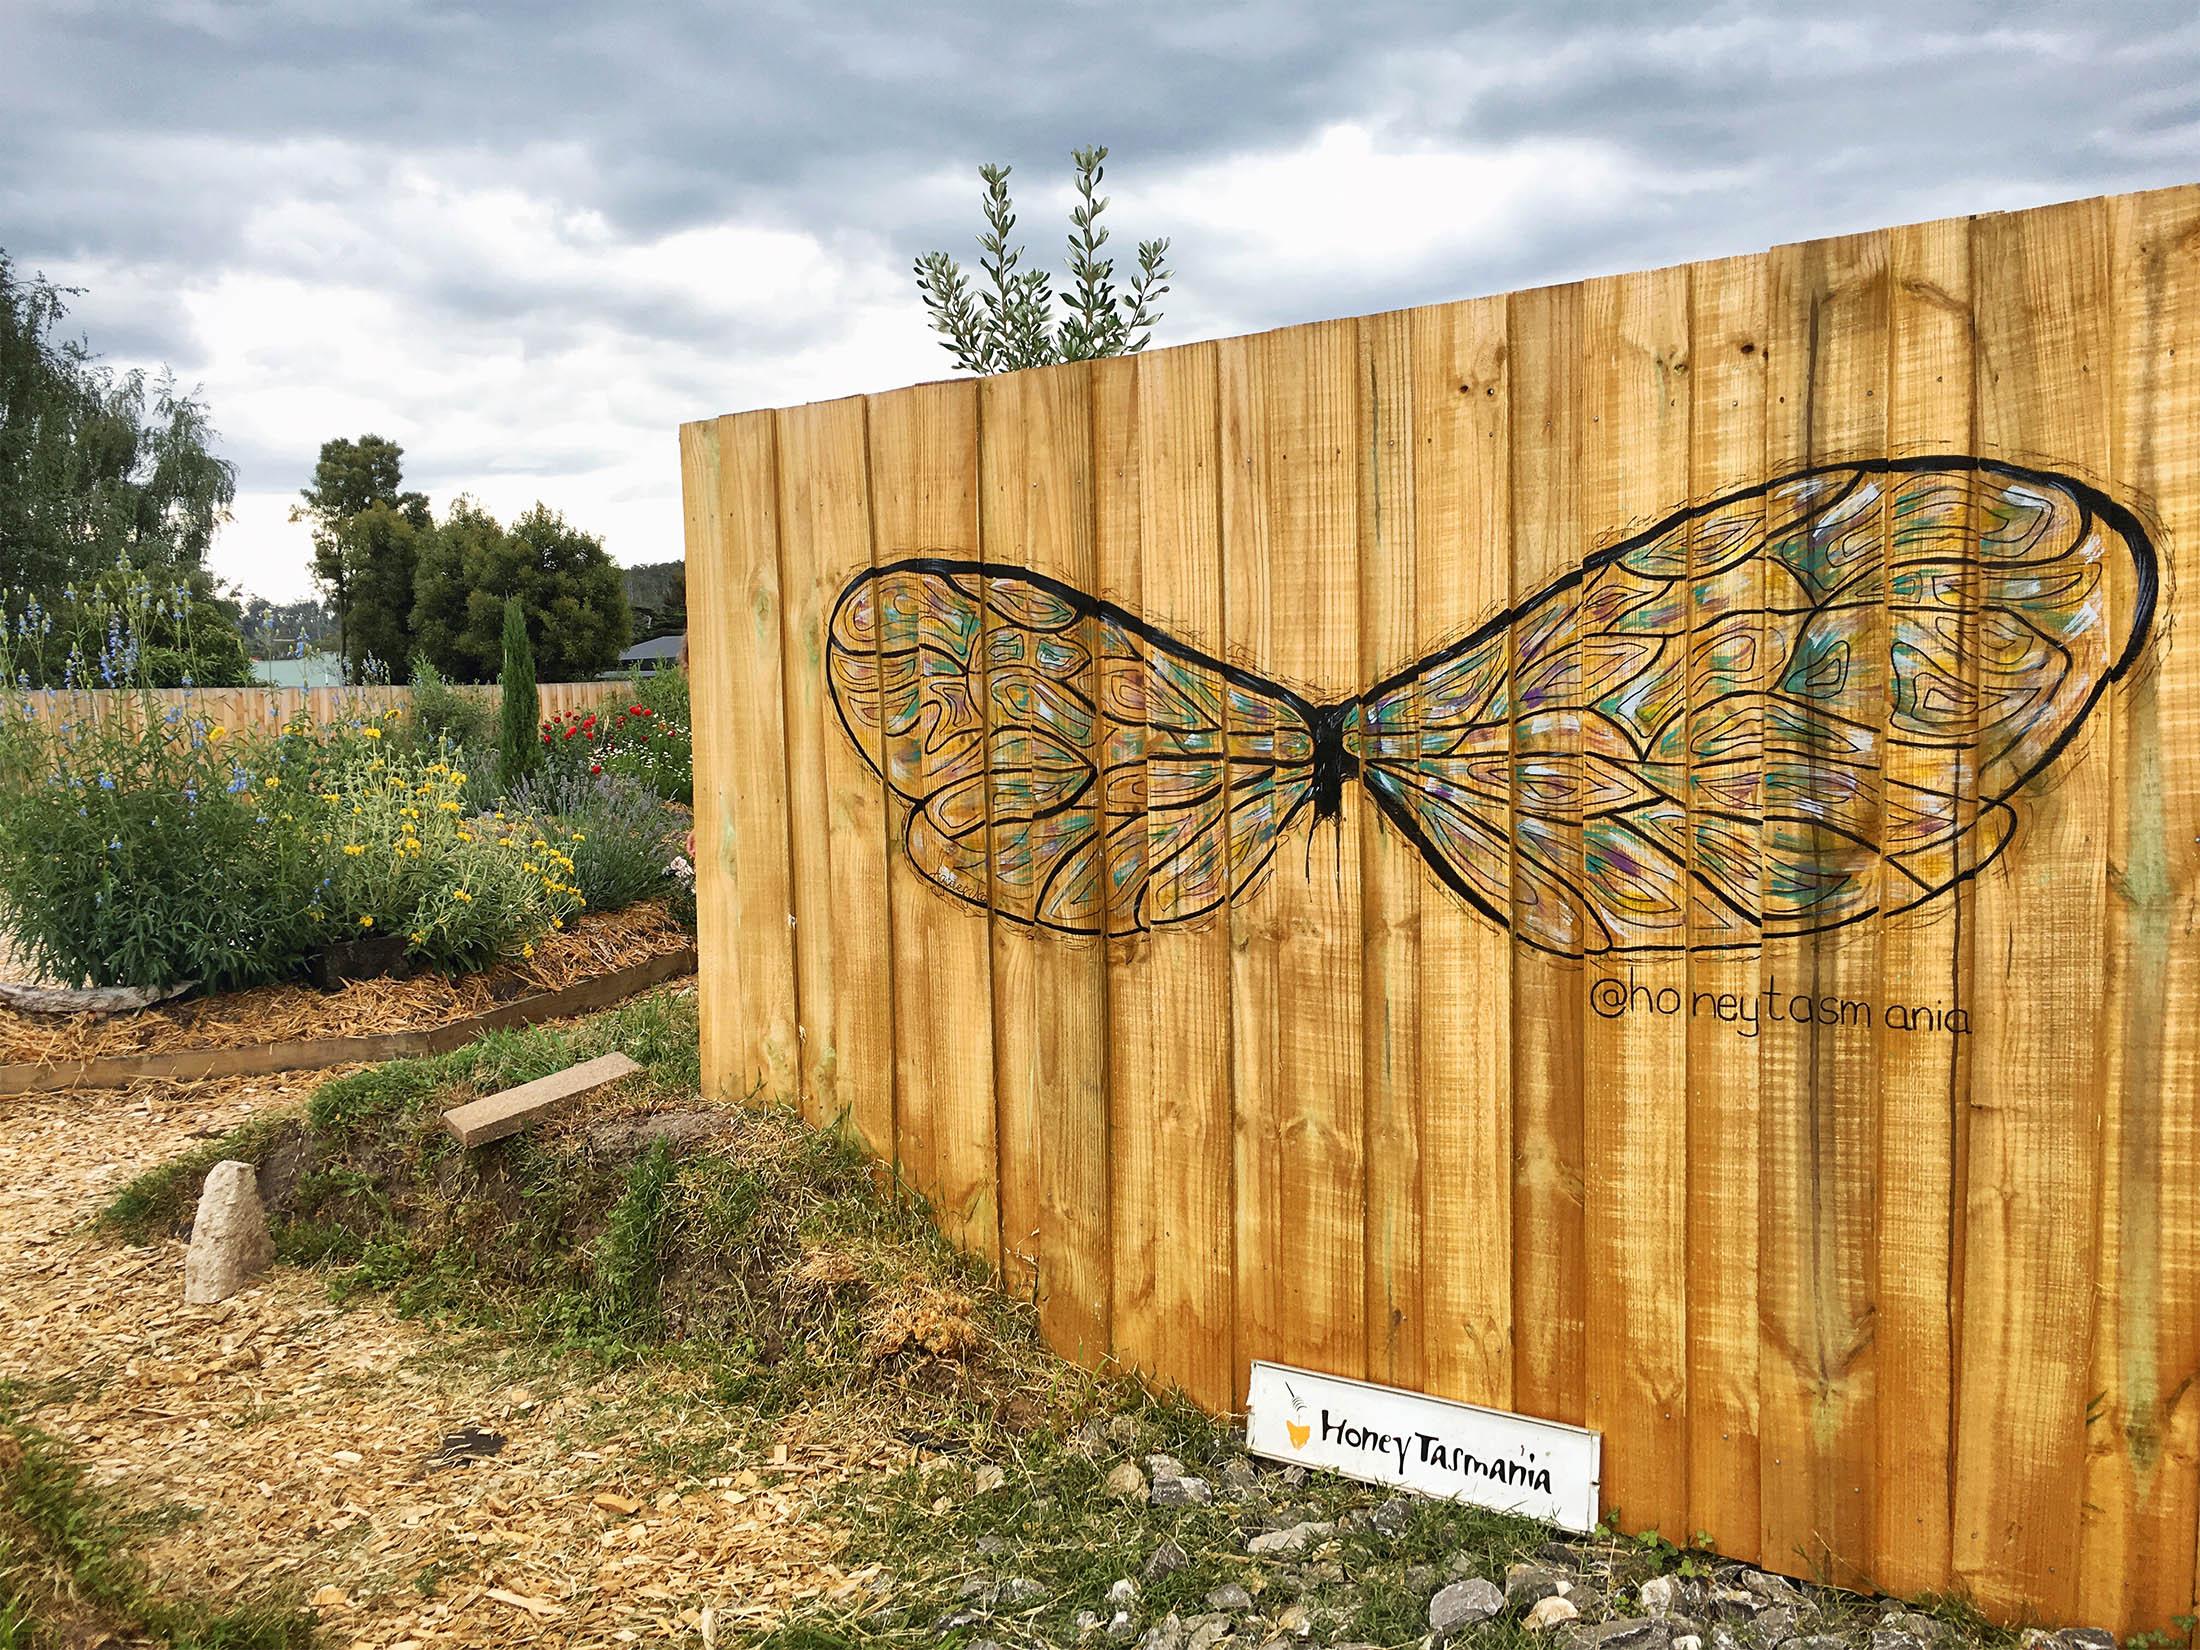 Honey Tasmania, Exeter, Tasmania   A fun and colourful bee wing mural for a beautiful honey shop at Exeter, Tasmania.